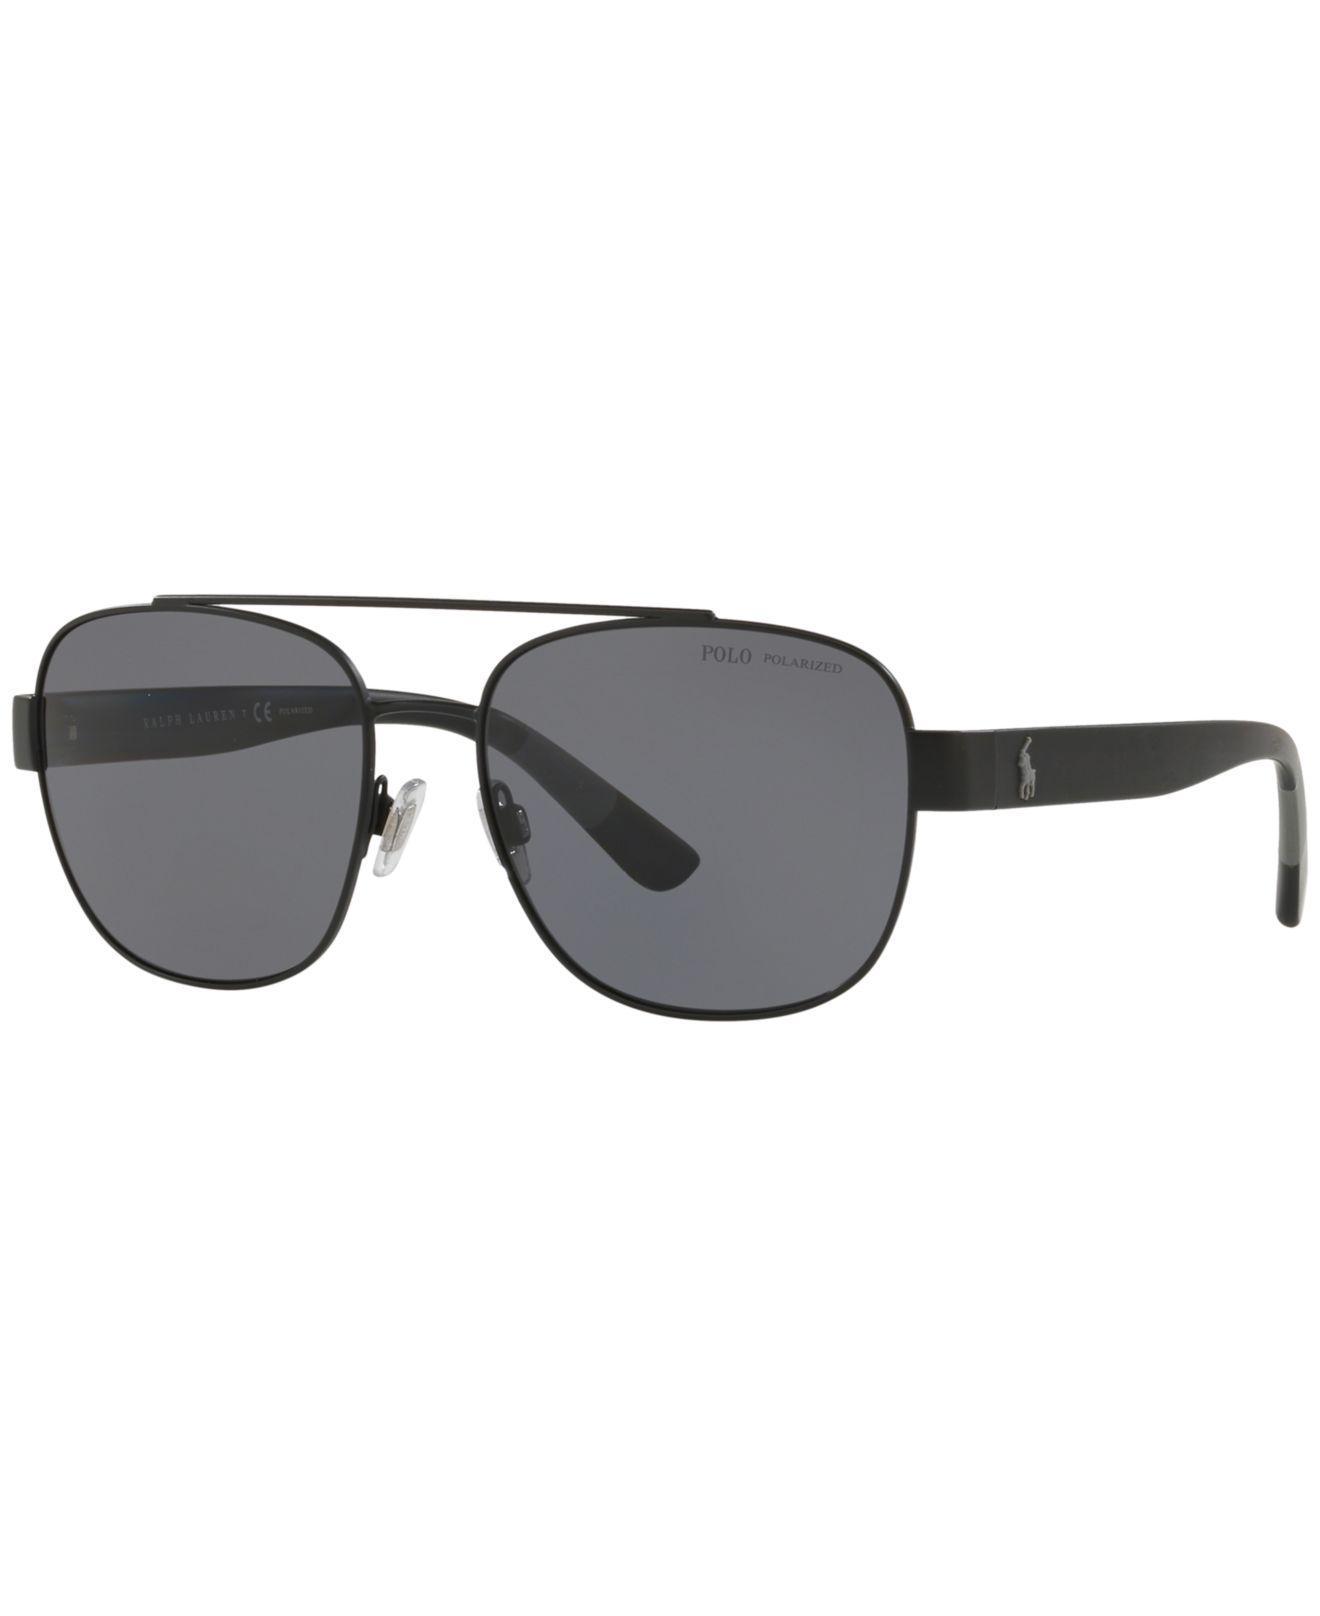 6ae5d137a3c8d Lyst - Polo Ralph Lauren Ph3119 in Black for Men